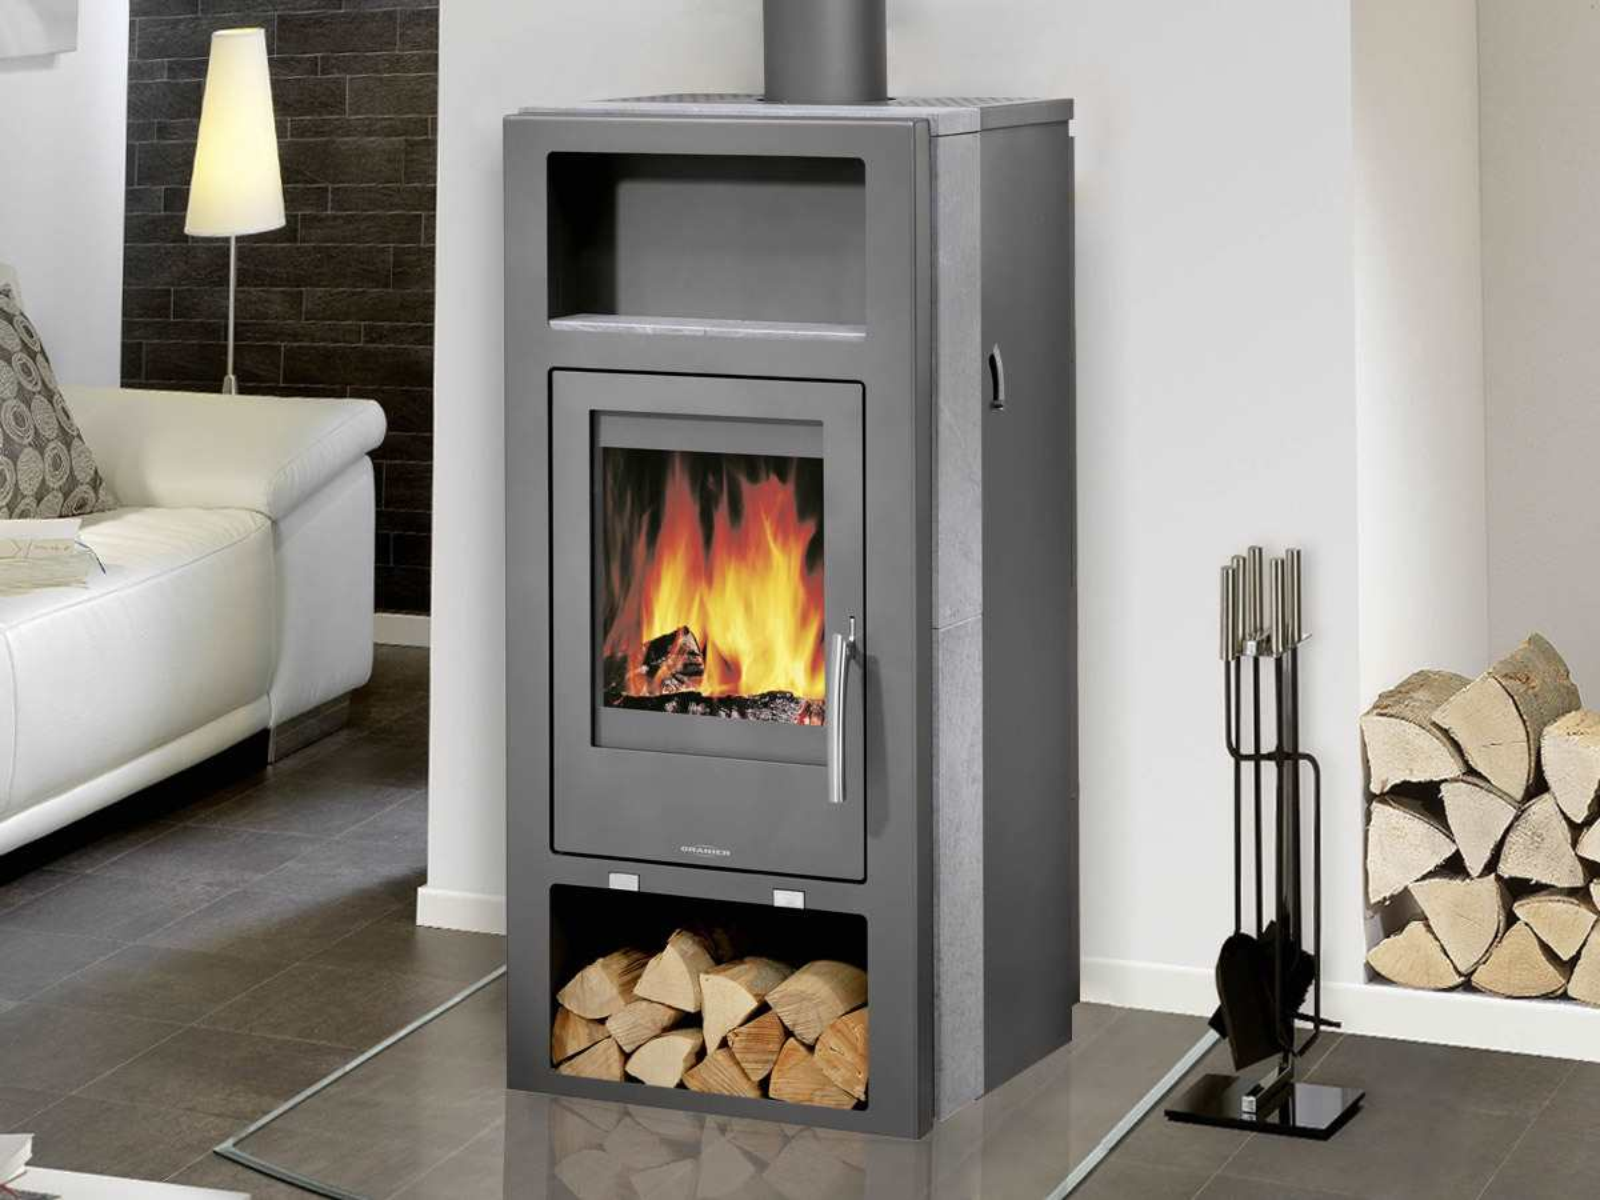 oranier 7602 10 belt aqua preisvergleich kamin g nstig kaufen bei. Black Bedroom Furniture Sets. Home Design Ideas